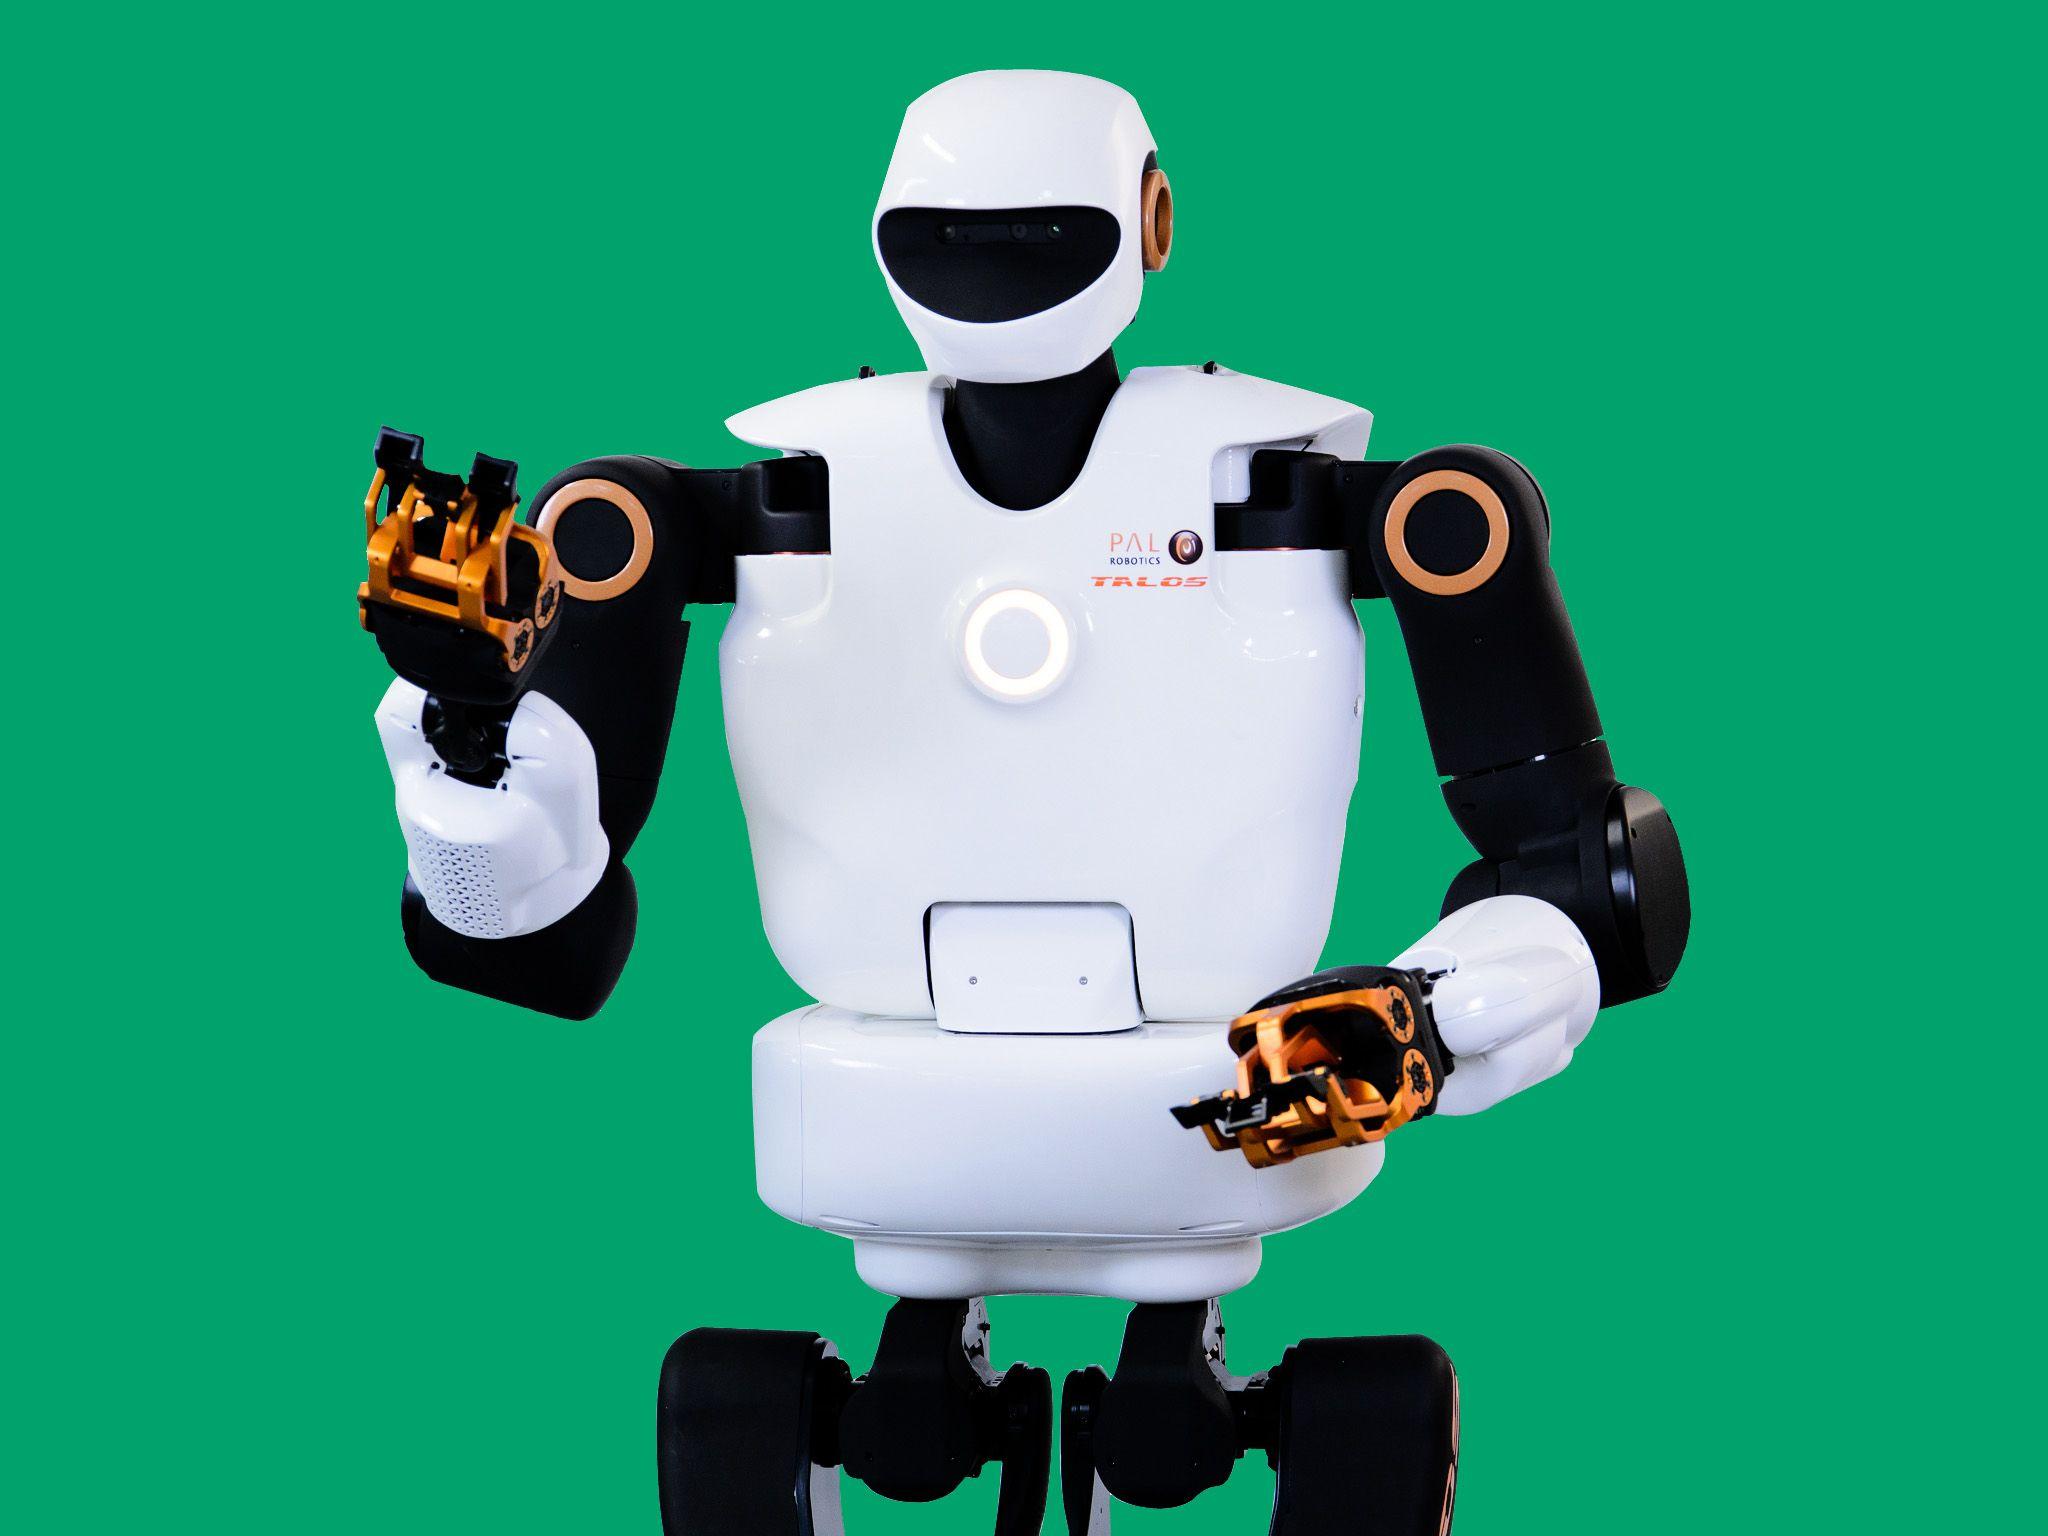 PAL Robotics' TALOS humanoid